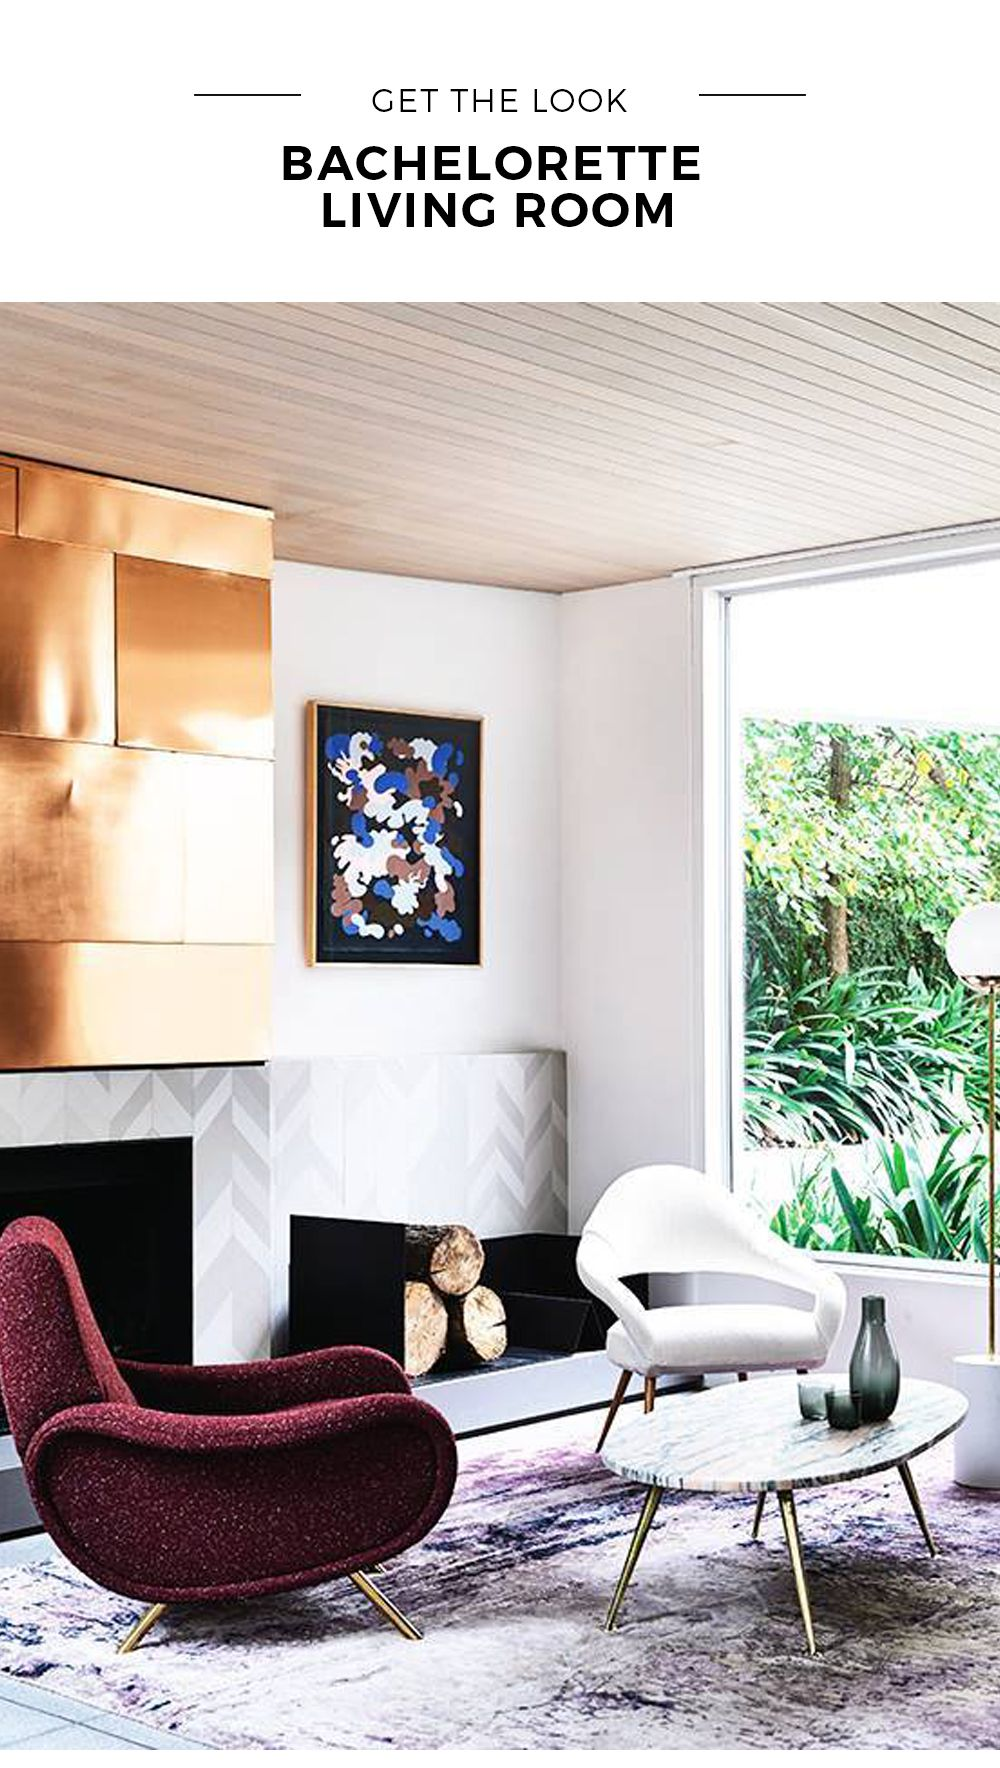 Get The Look: Bachelorette Living Room - Black Rooster Decor | Décor ...